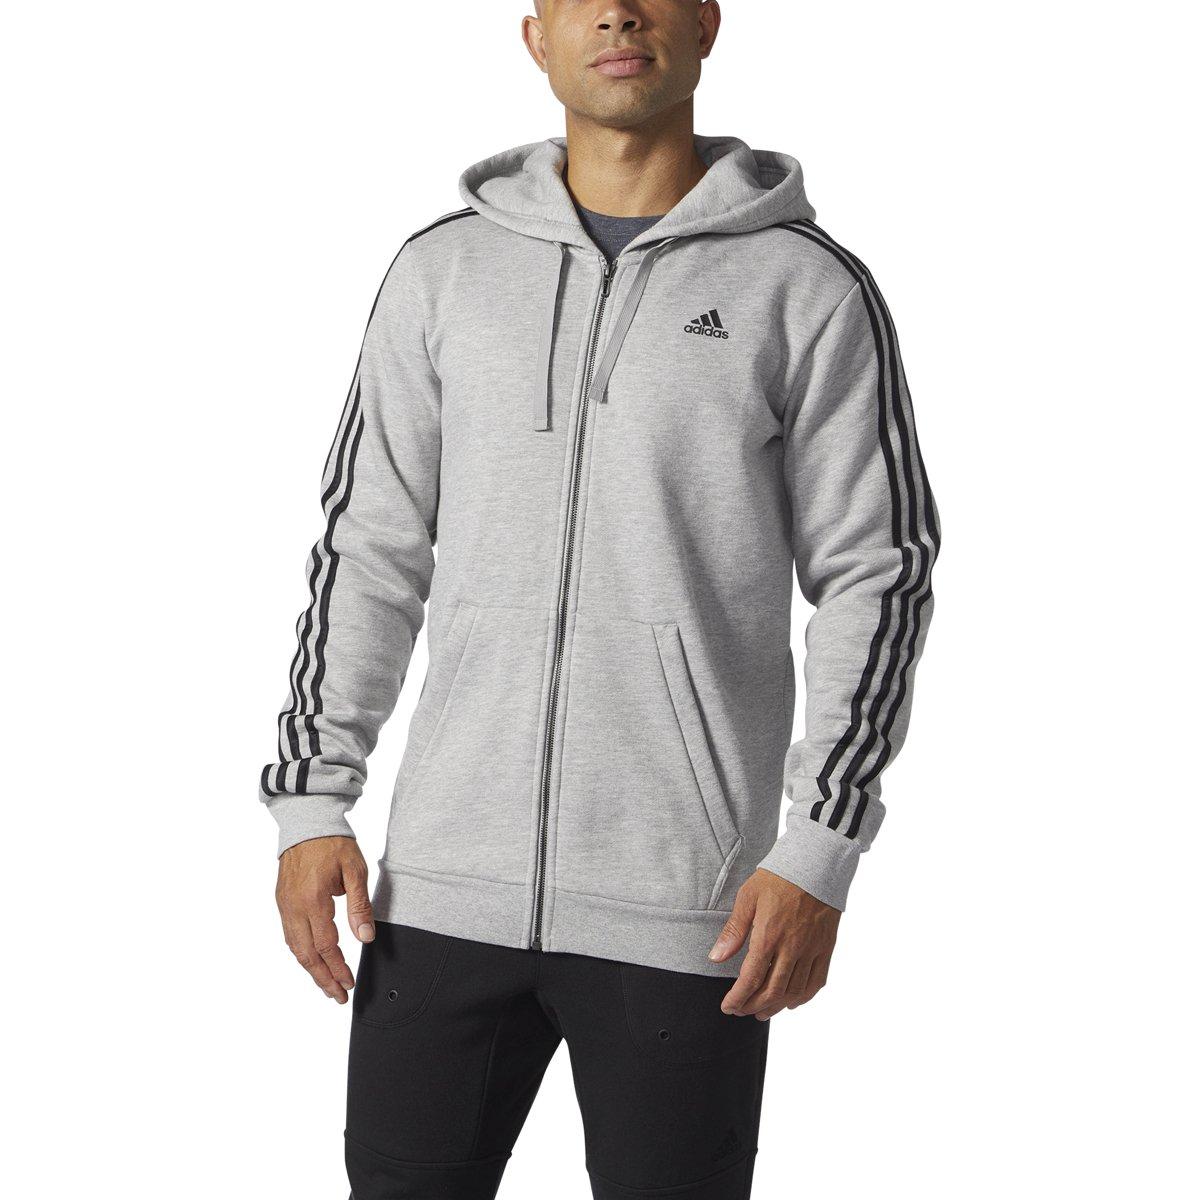 AdidasメンズAthletics Essential Cotton 3ストライプフルZipパーカー B01N9JKCHA 4X-Large|Medium Grey Heather/Black Medium Grey Heather/Black 4X-Large